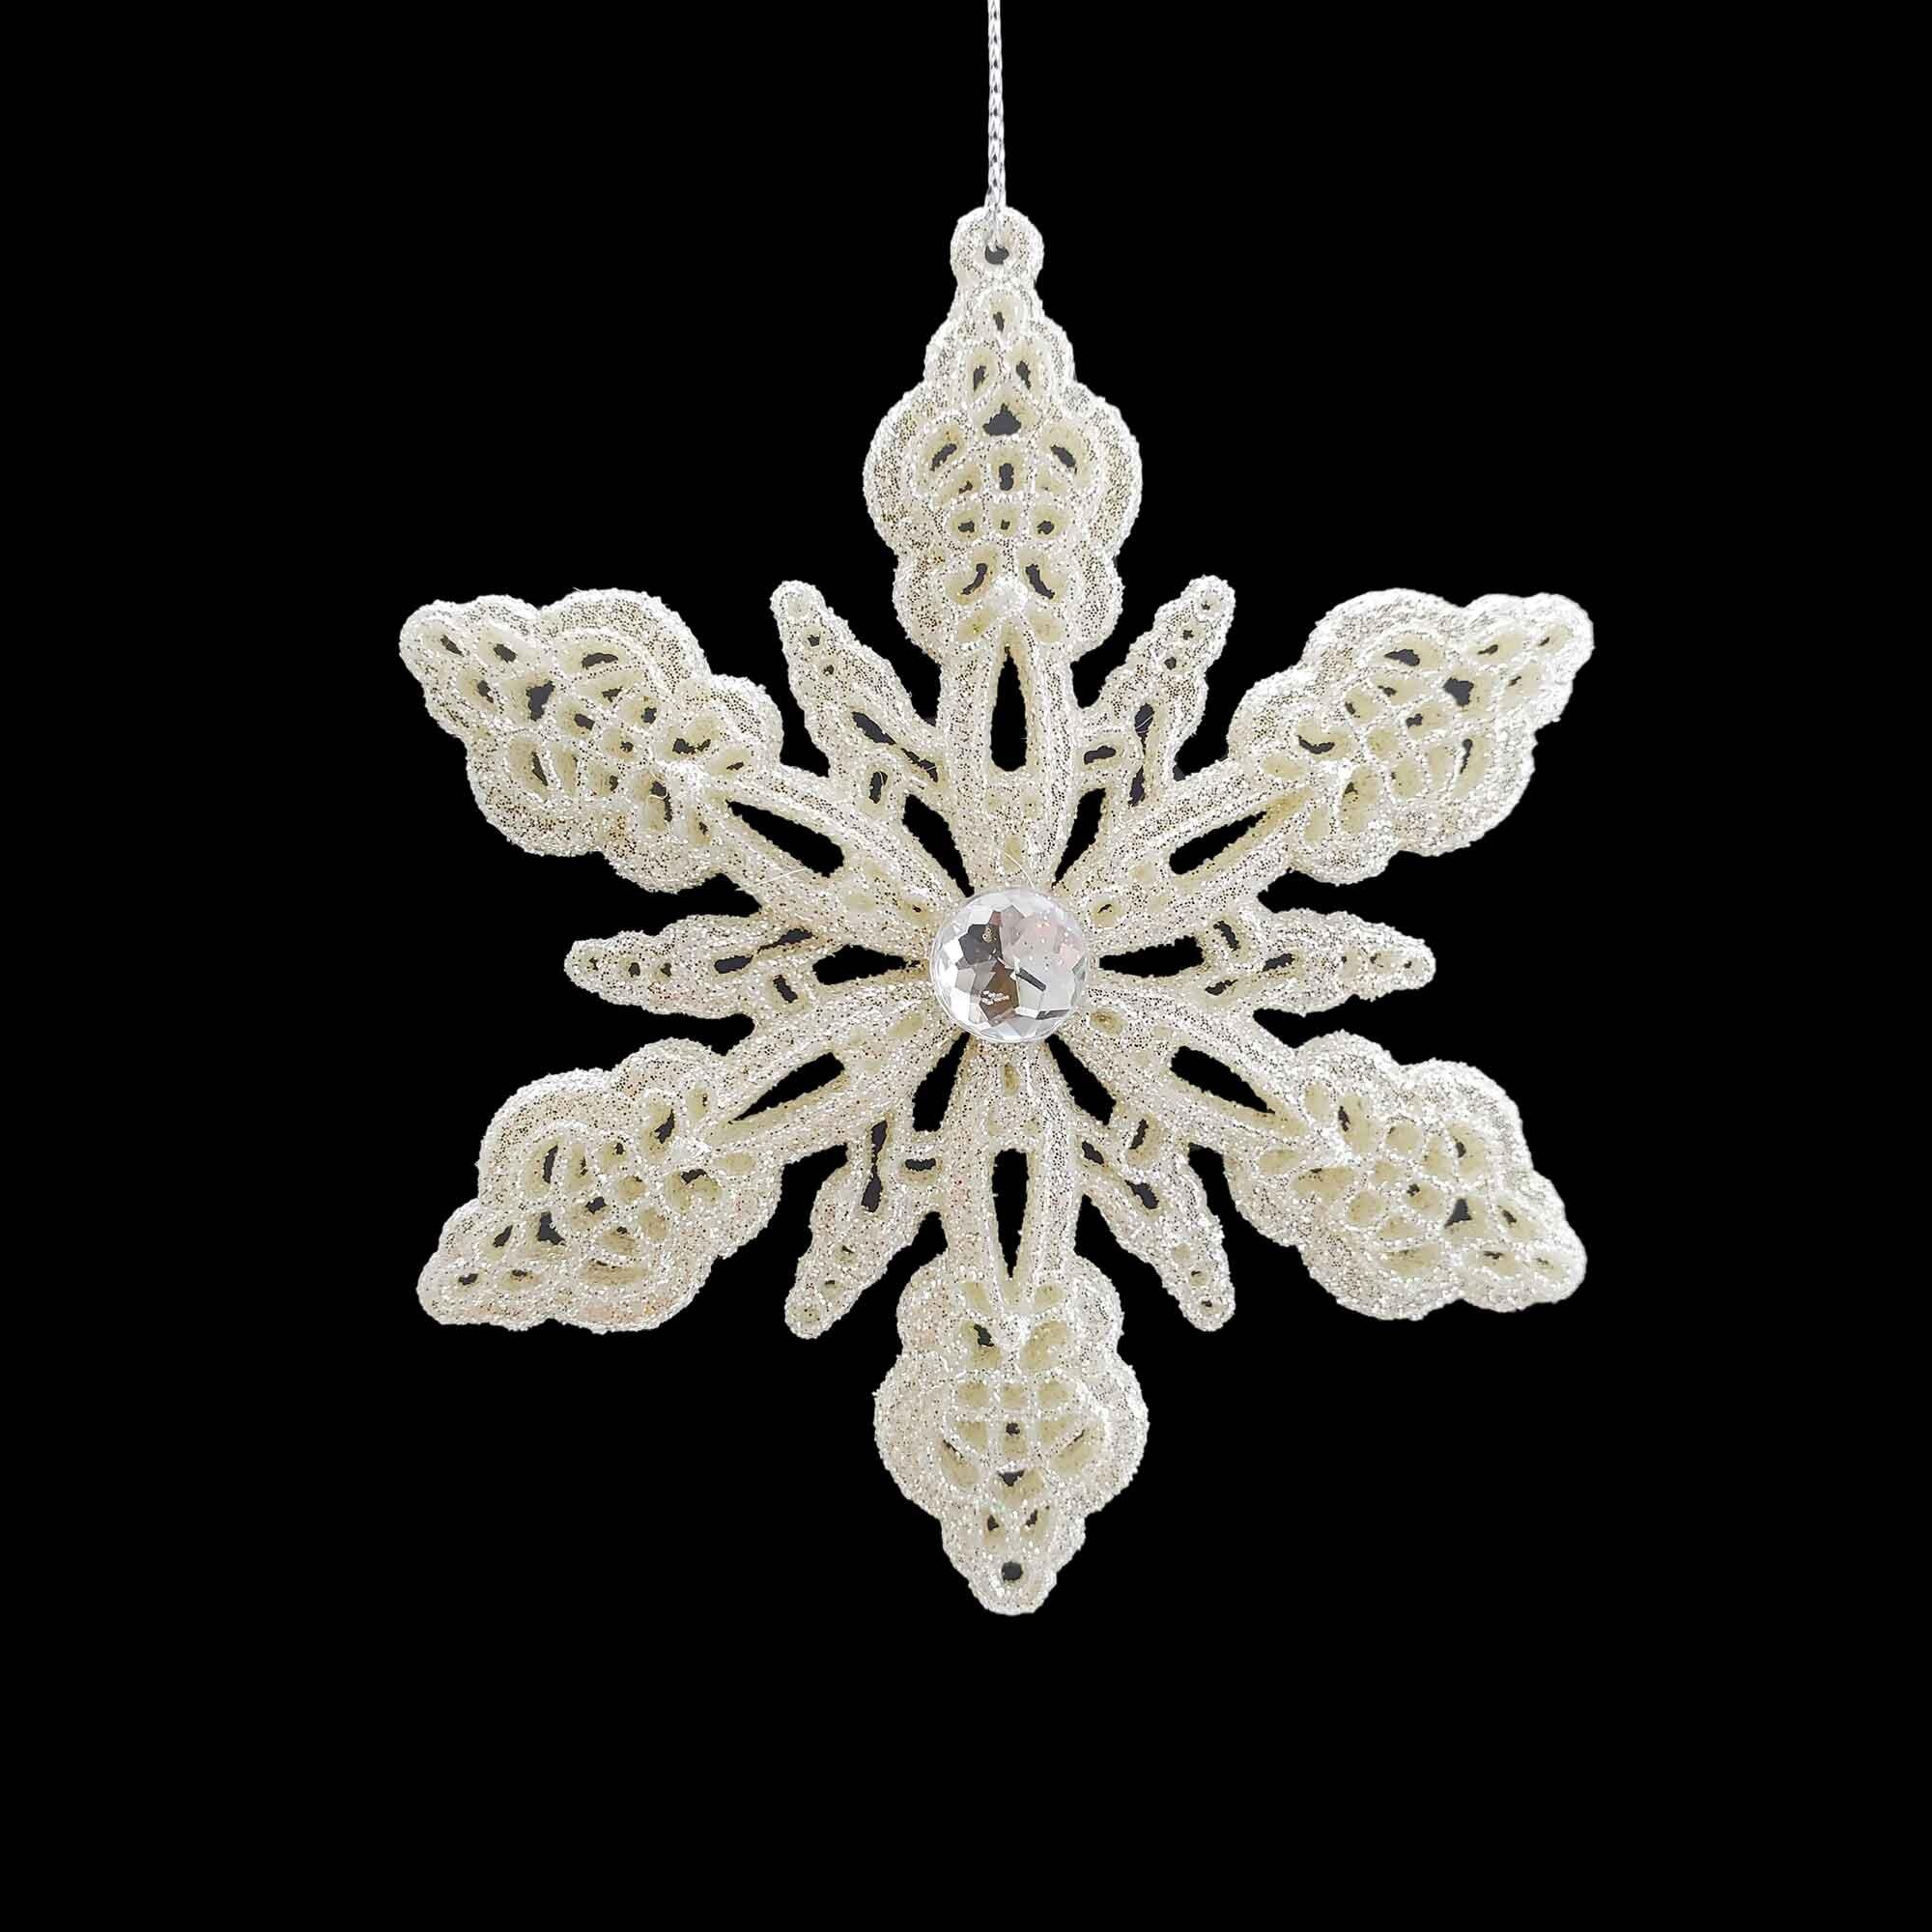 The Holiday Aisle Glitter Gem Snowflake Holiday Shaped Ornament Wayfair